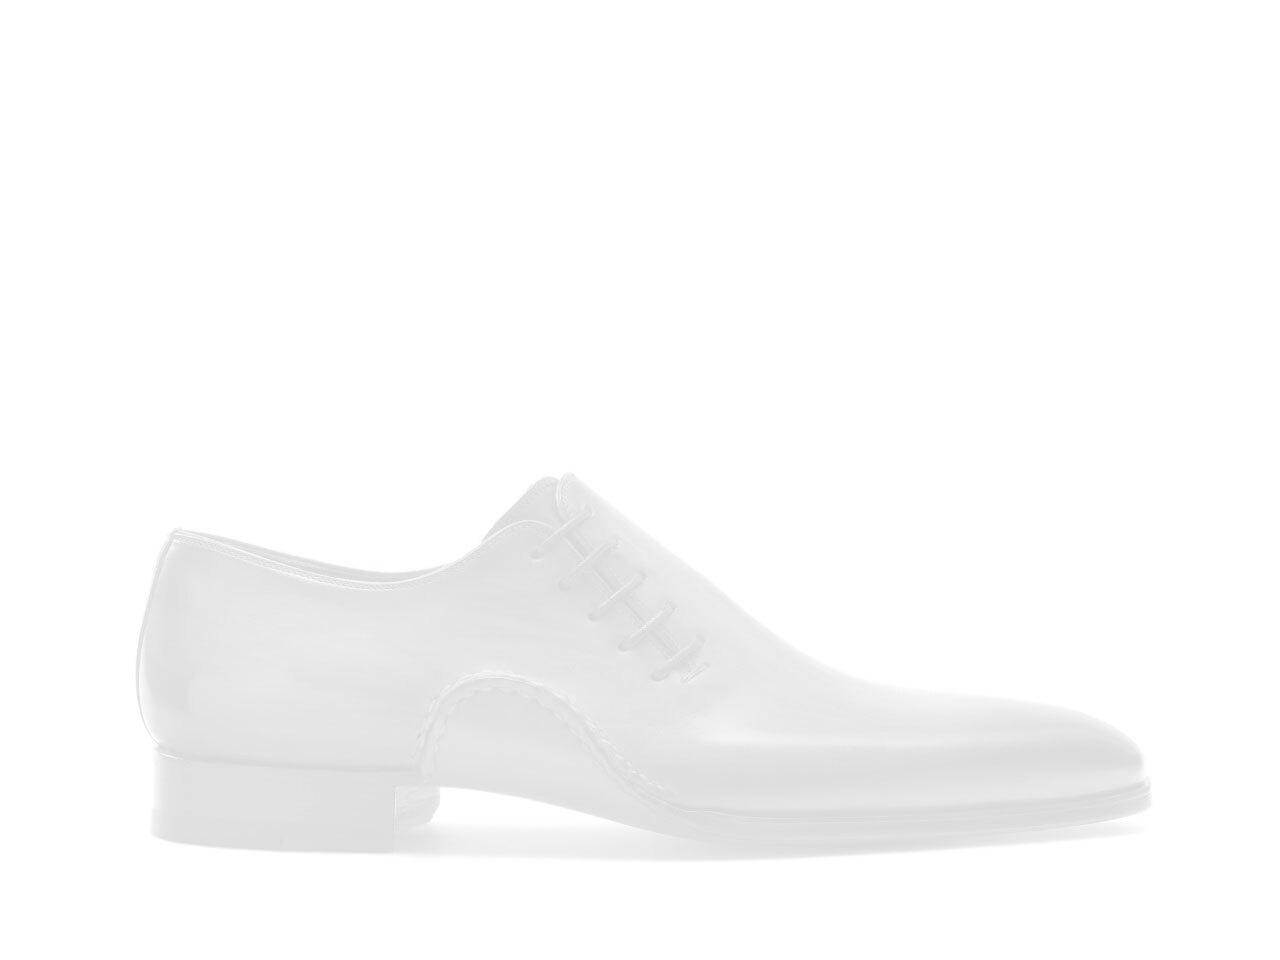 Pair of the Magnanni Turo Lo Black Men's Sneakers